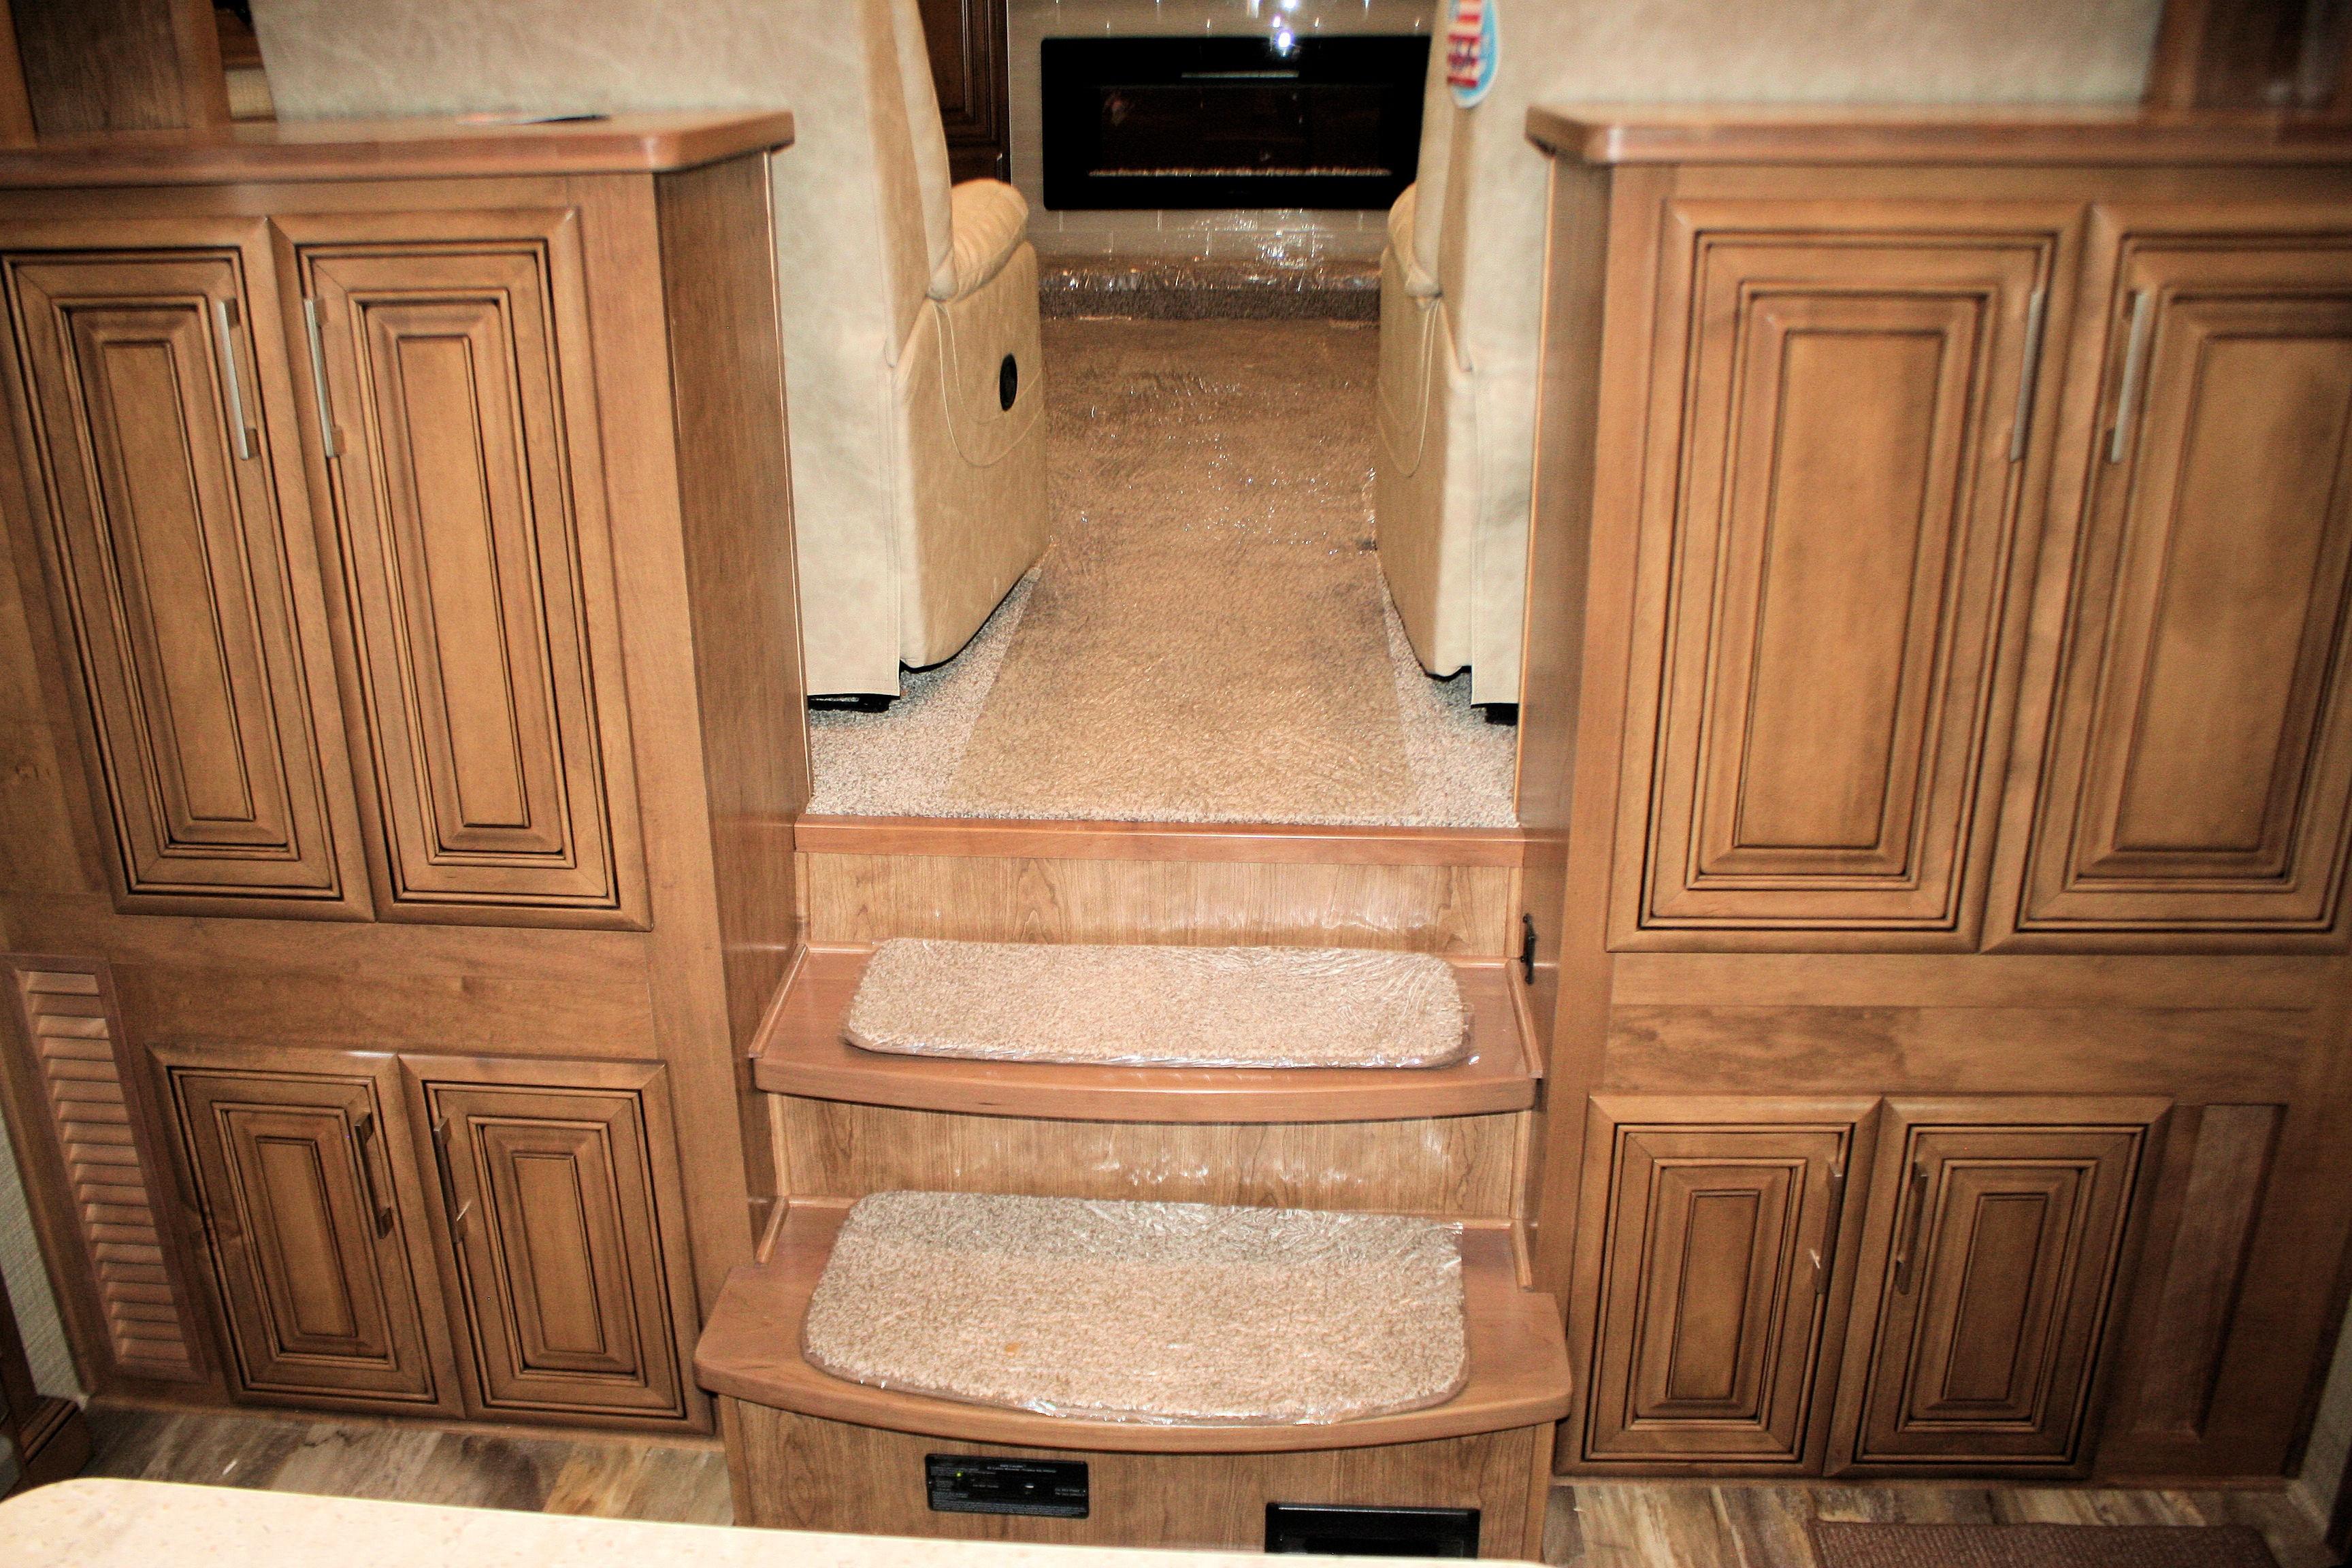 hardwood flooring franklin nc of new 2019 drv mobile suites44 nashville fifth wheel rv in regarding click here for larger image